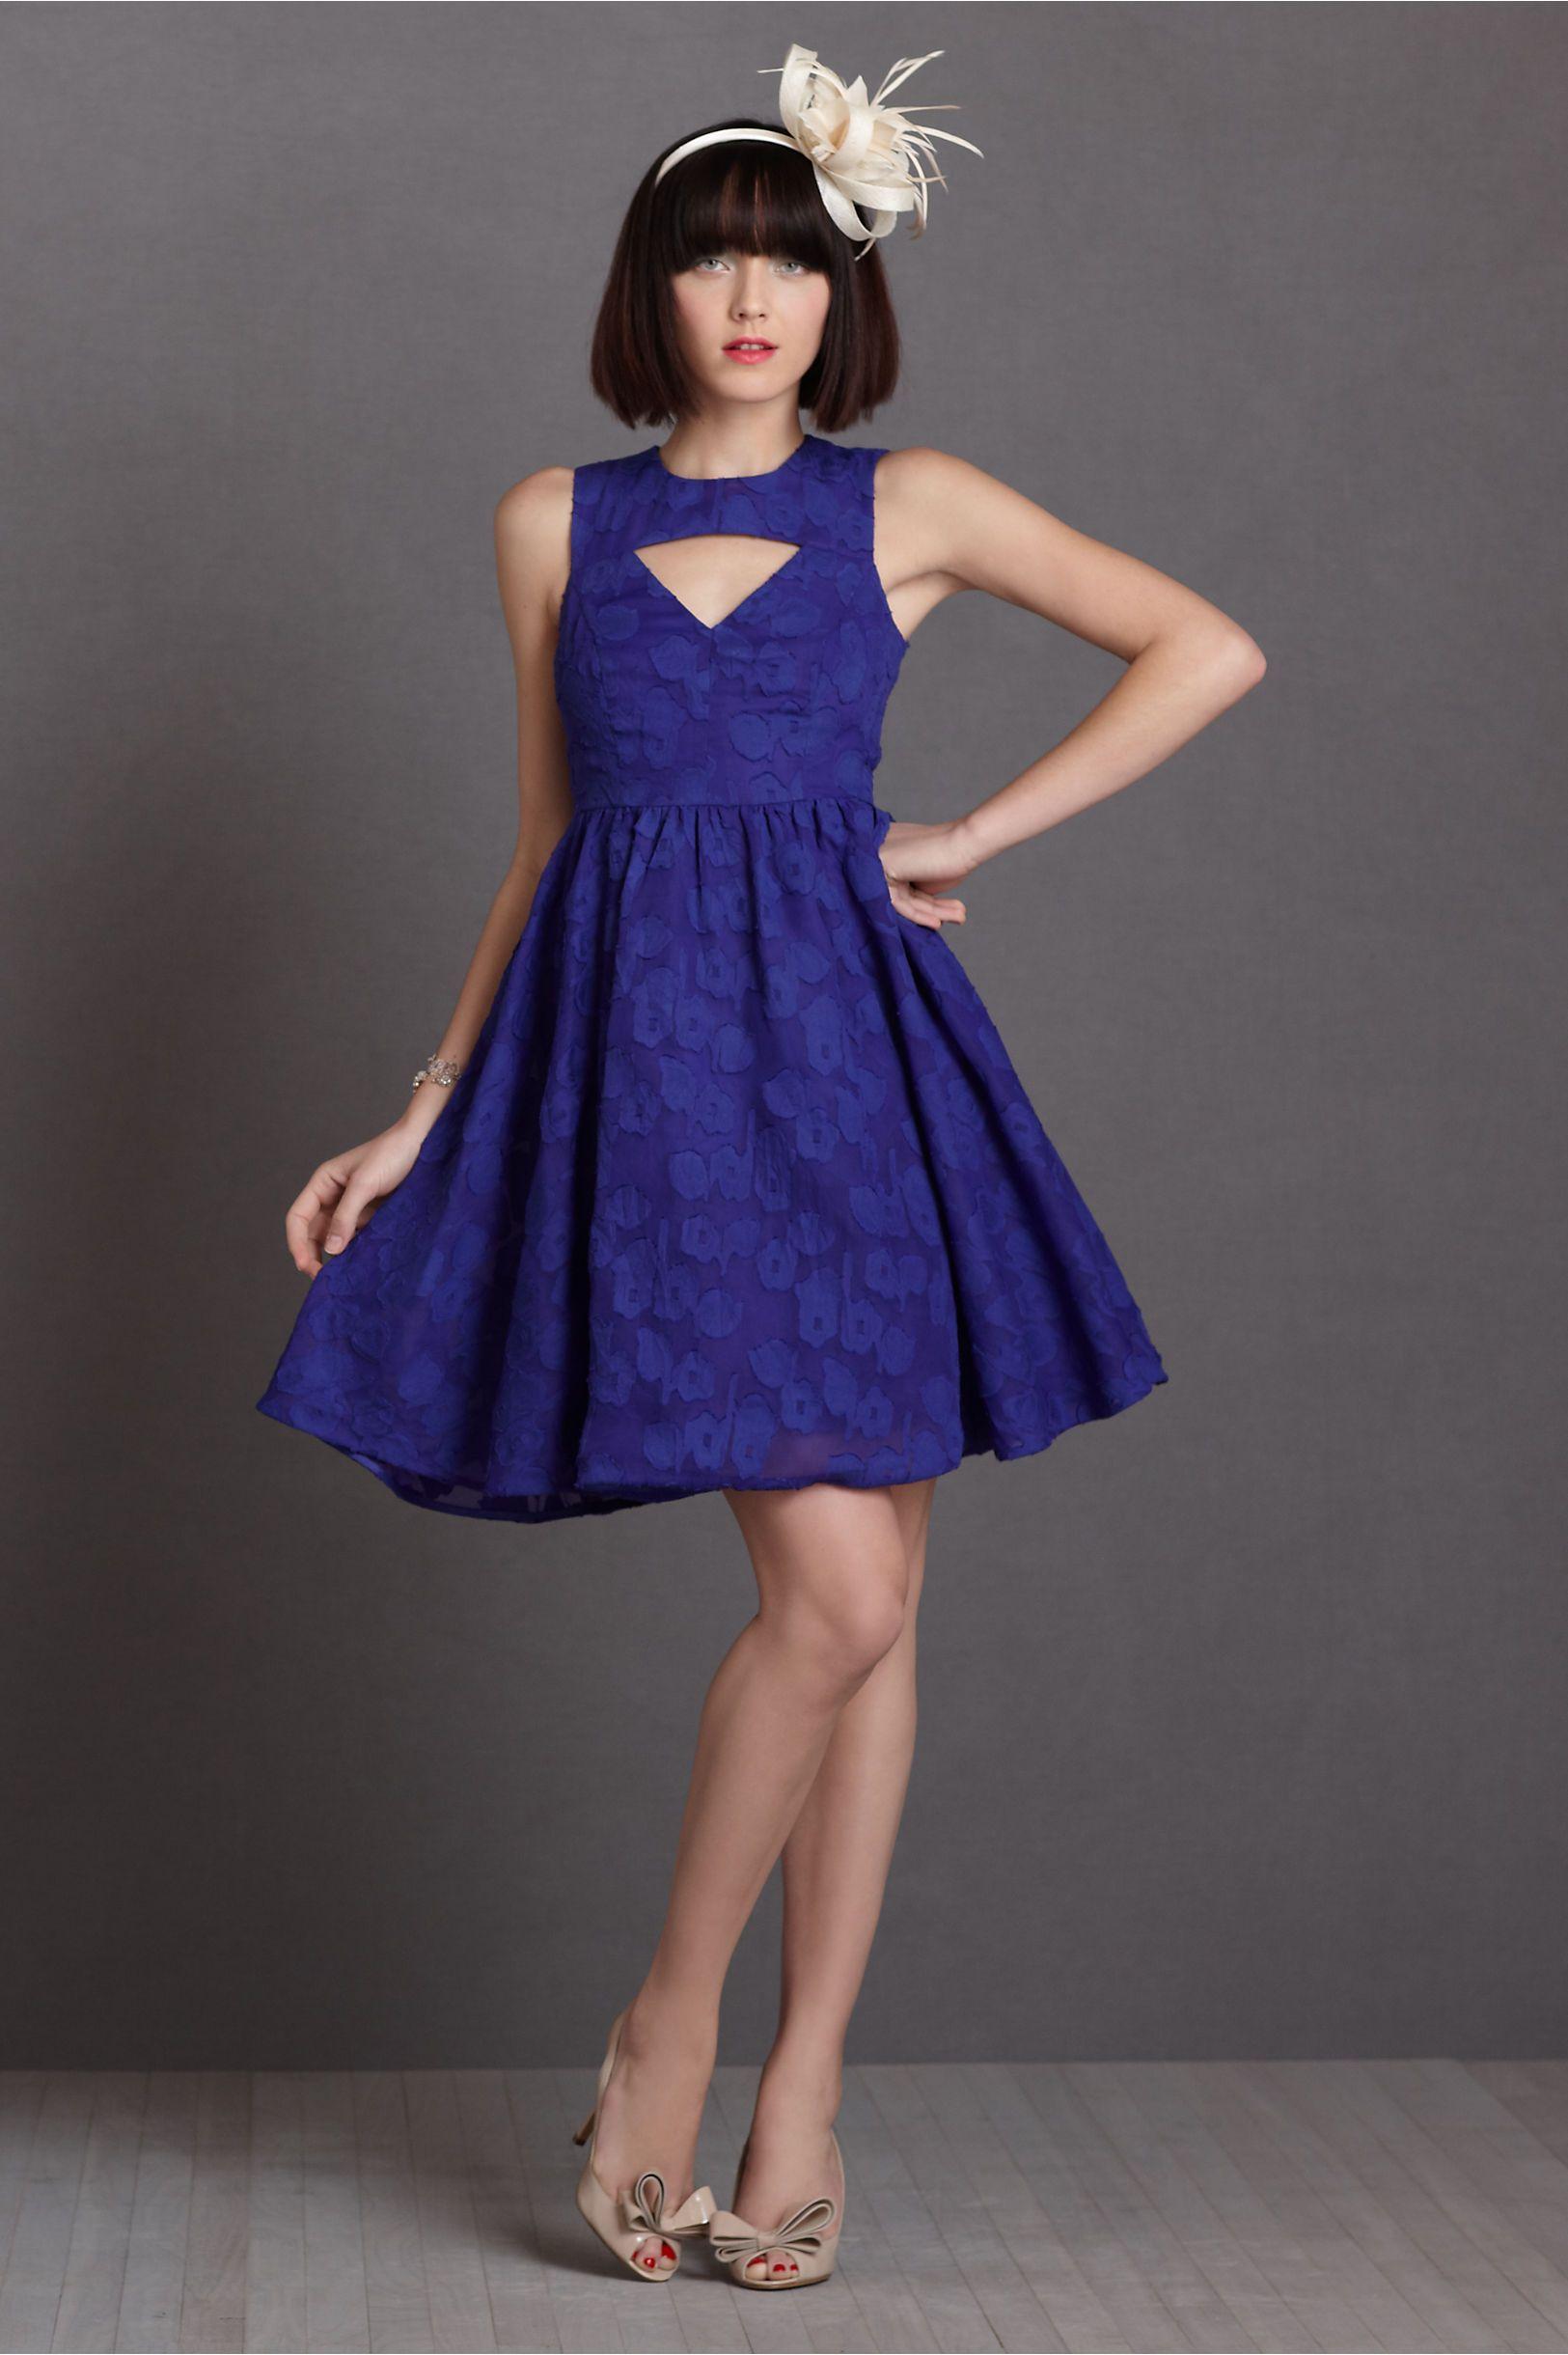 Violet Vim Dress | Chic | Pinterest | Azul, Quiero y Mundo